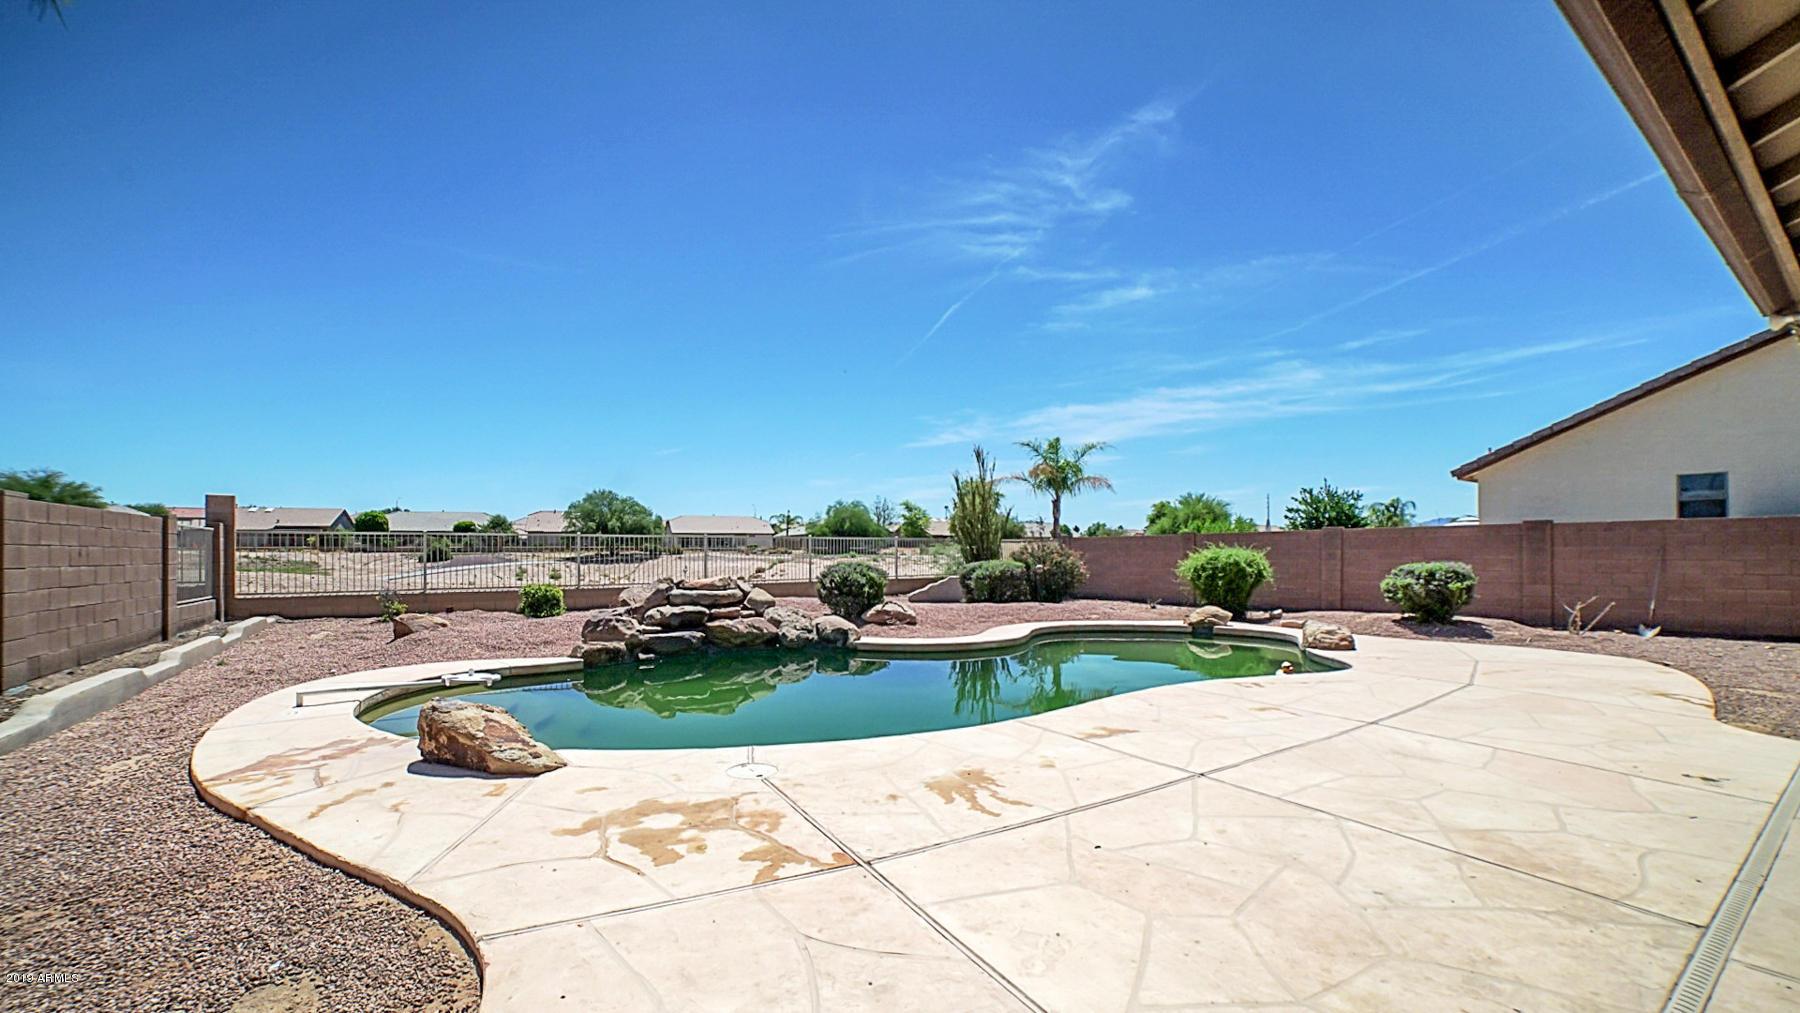 MLS 5926312 713 S 120TH Avenue, Avondale, AZ 85323 Avondale AZ Golf